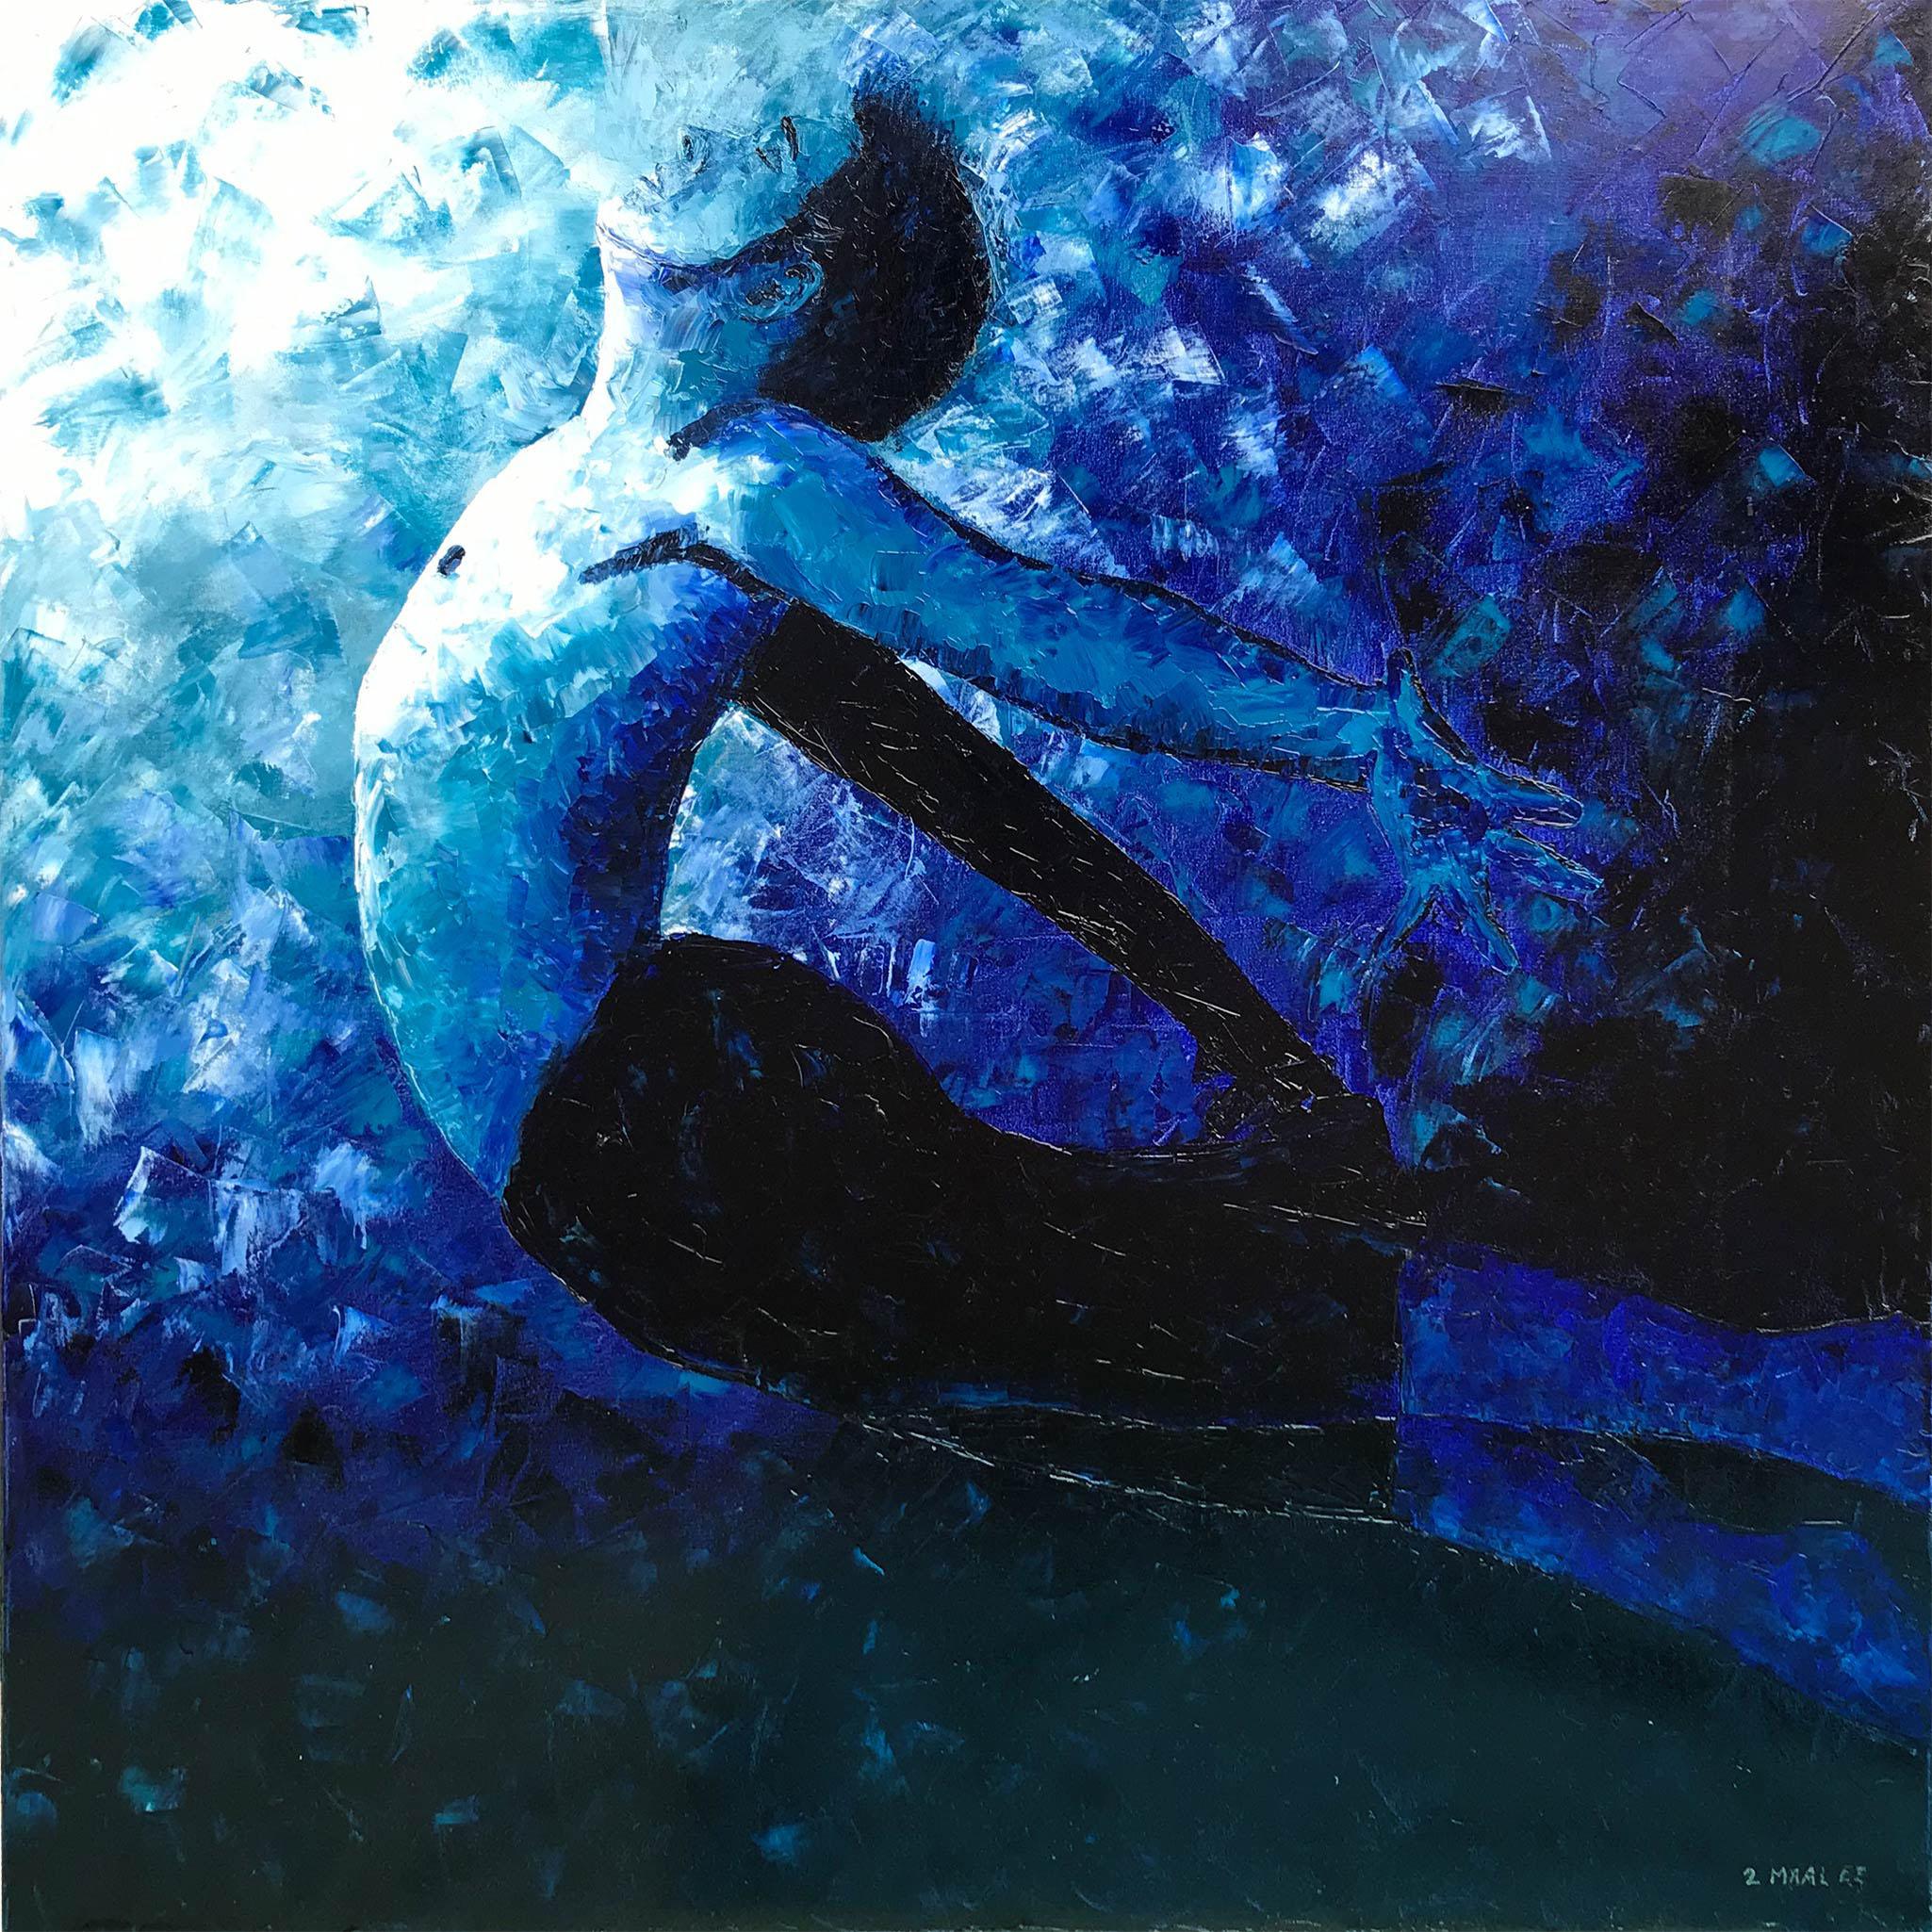 2 MAAL EE | People | Blue Passion 2